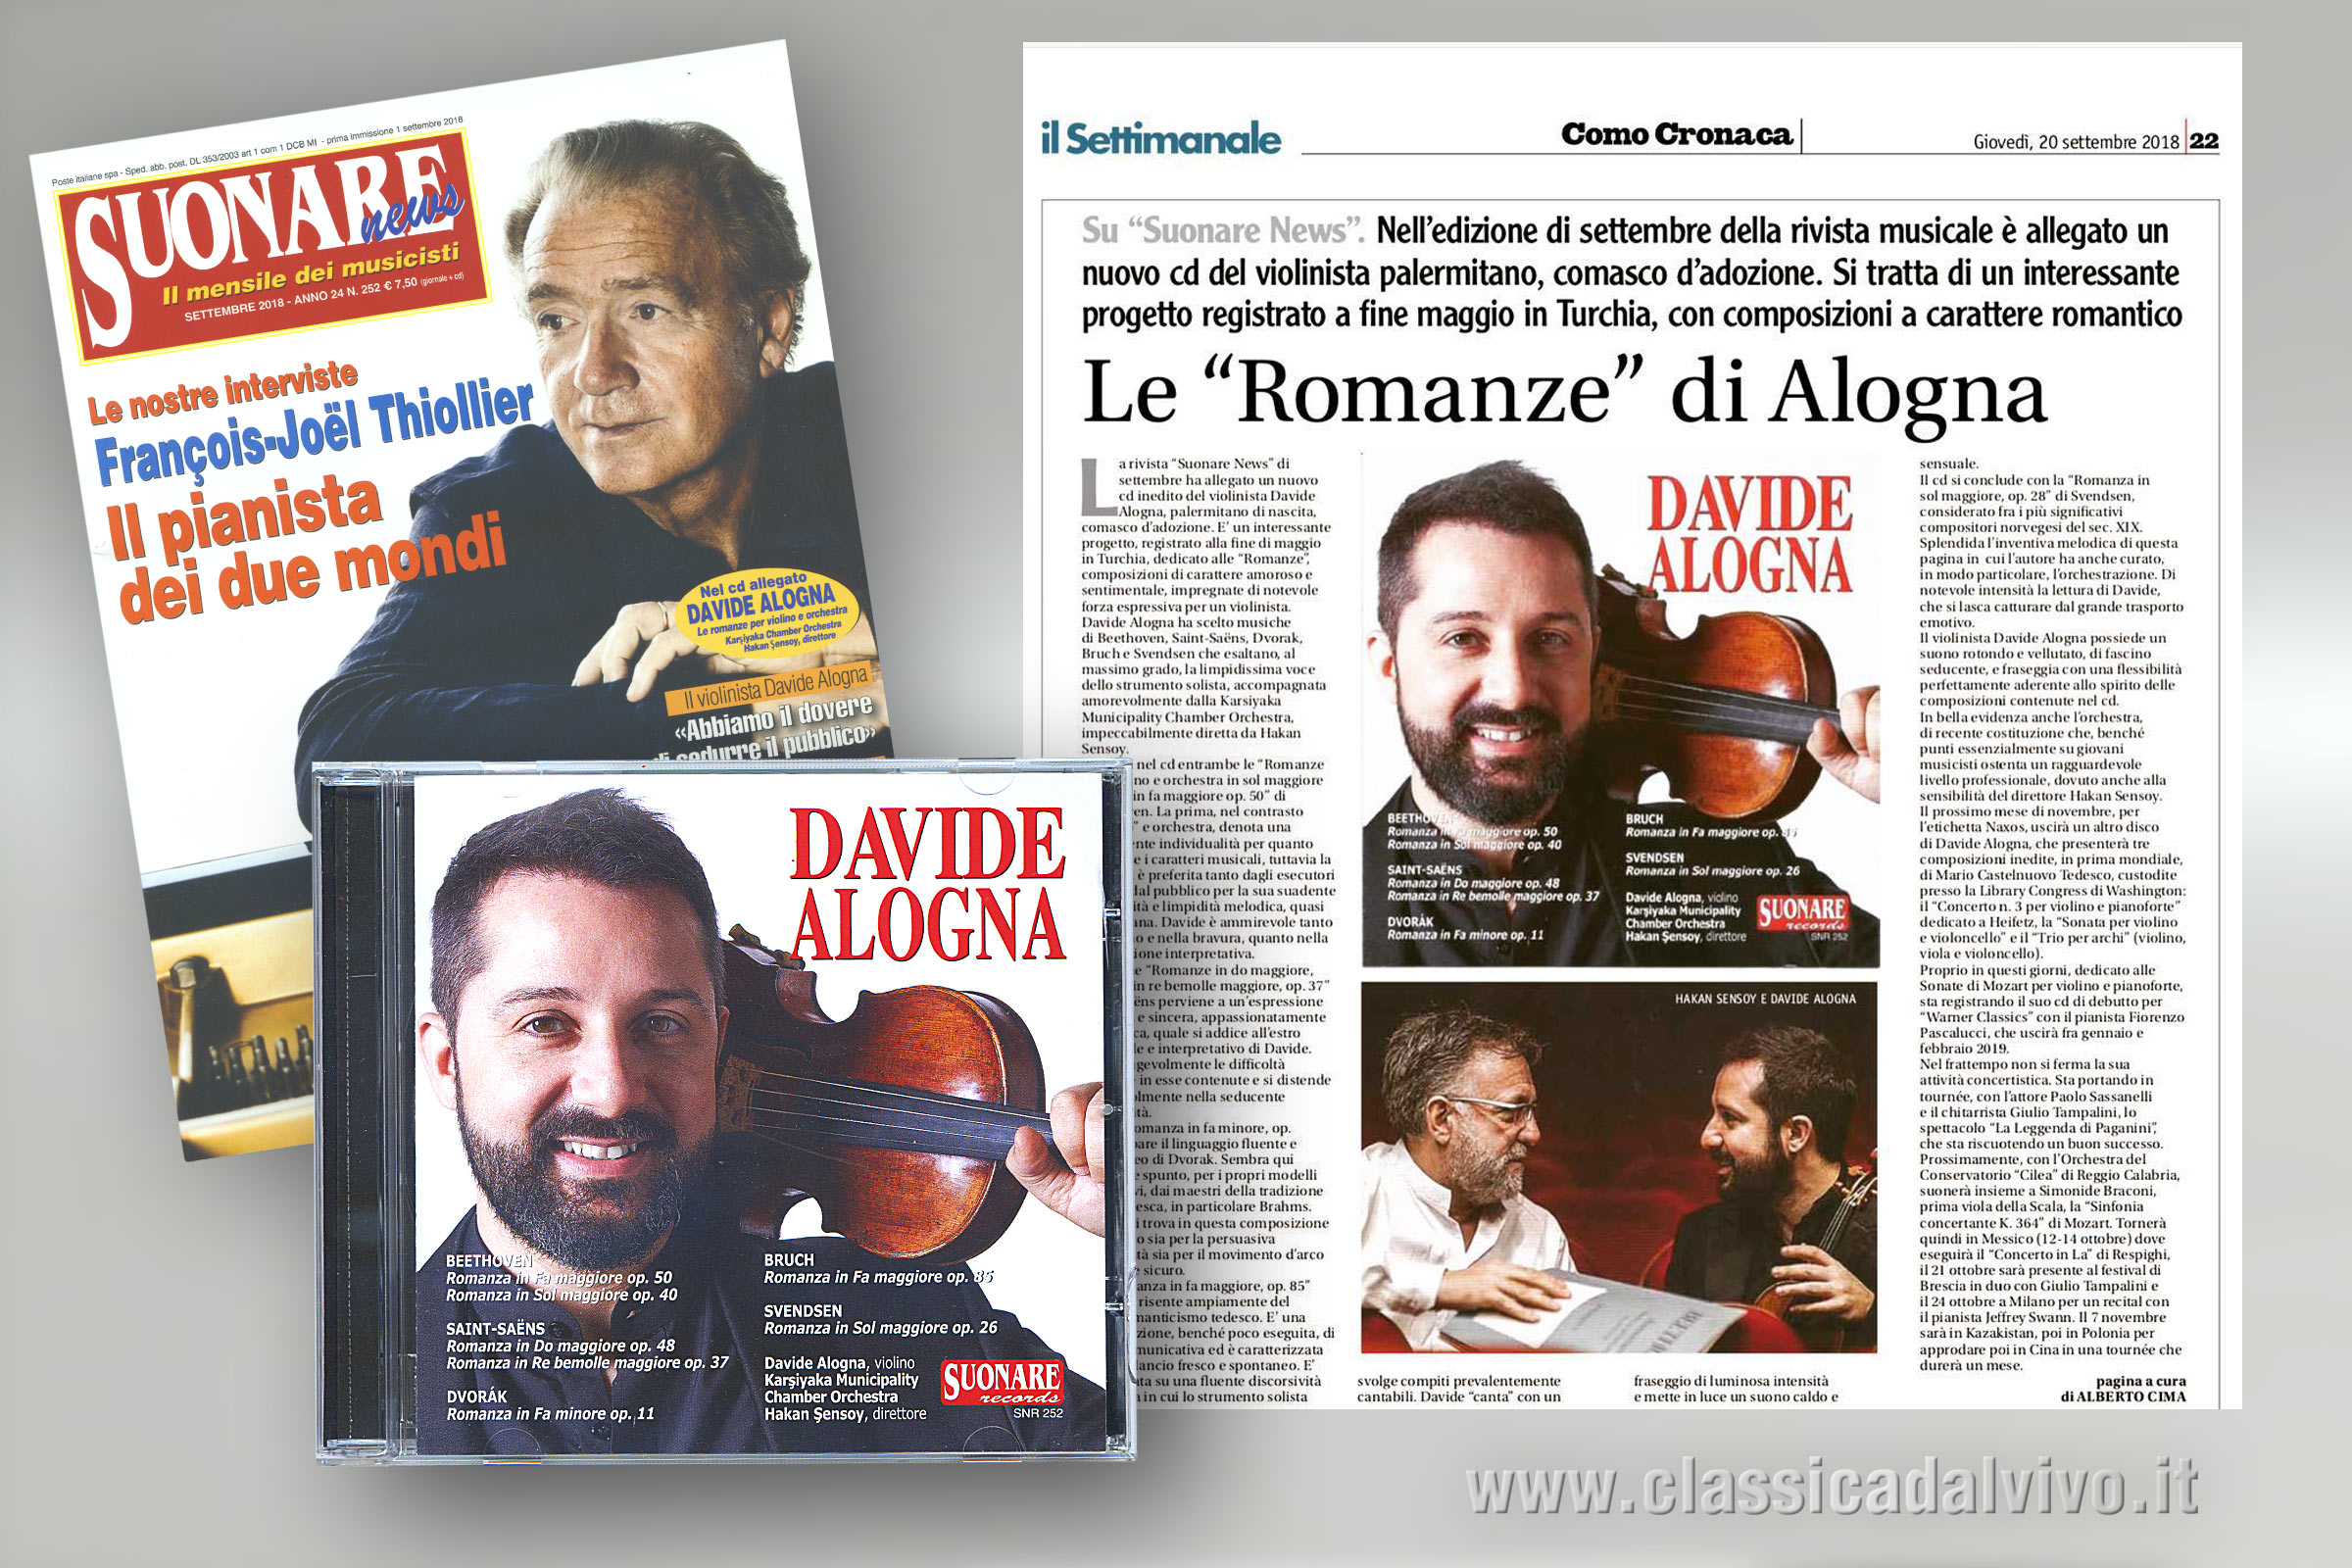 Davide Alogna - Hakan Sensoy - CD per Suonare News